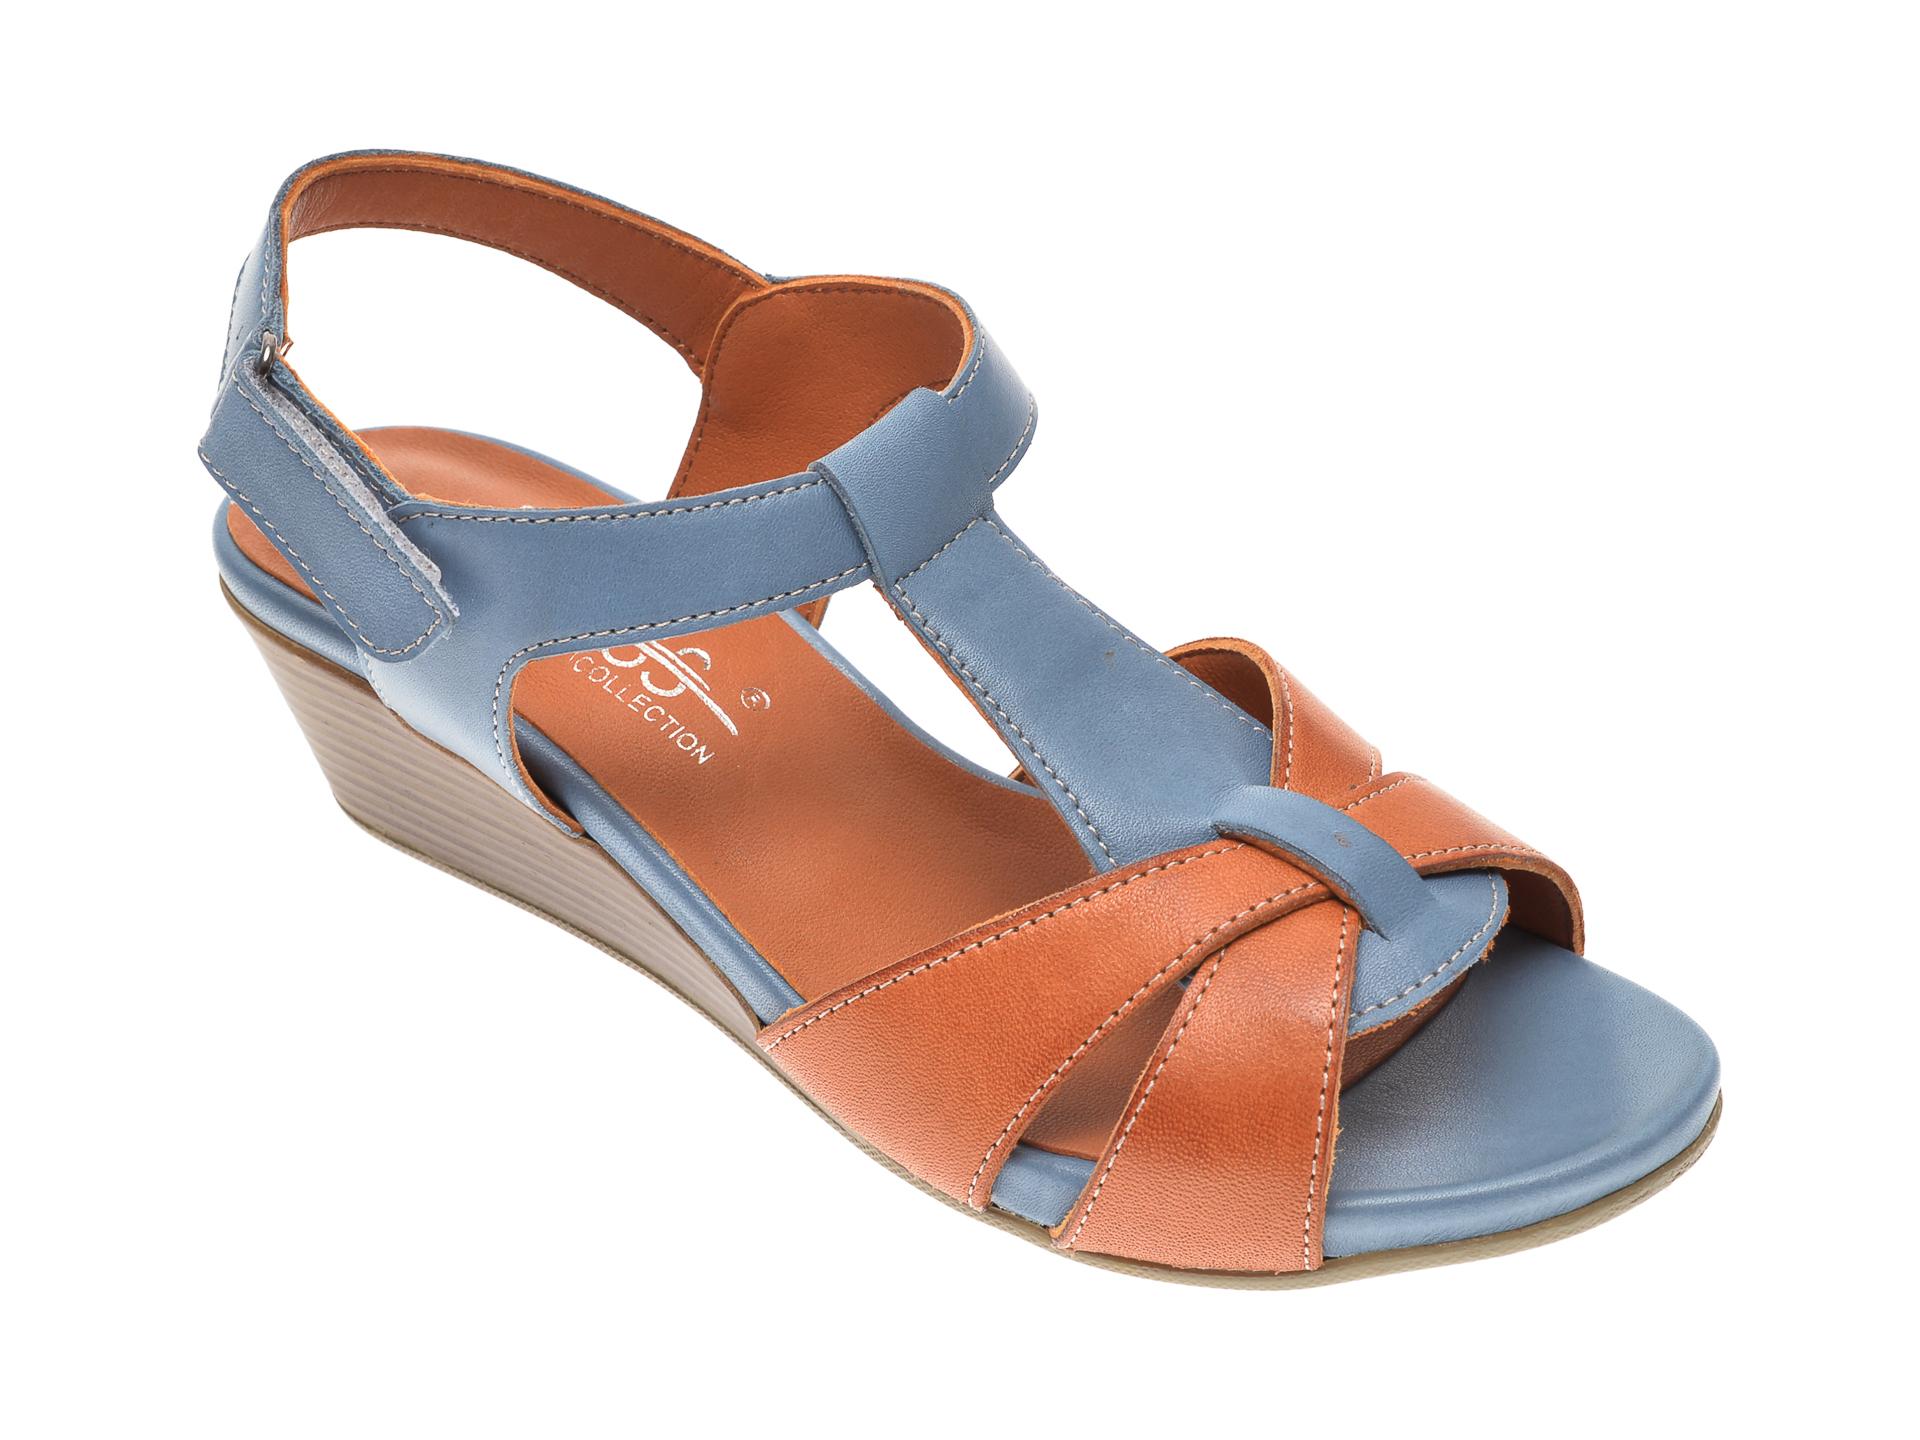 Sandale PASS COLLECTION albastre, 6043, din piele naturala